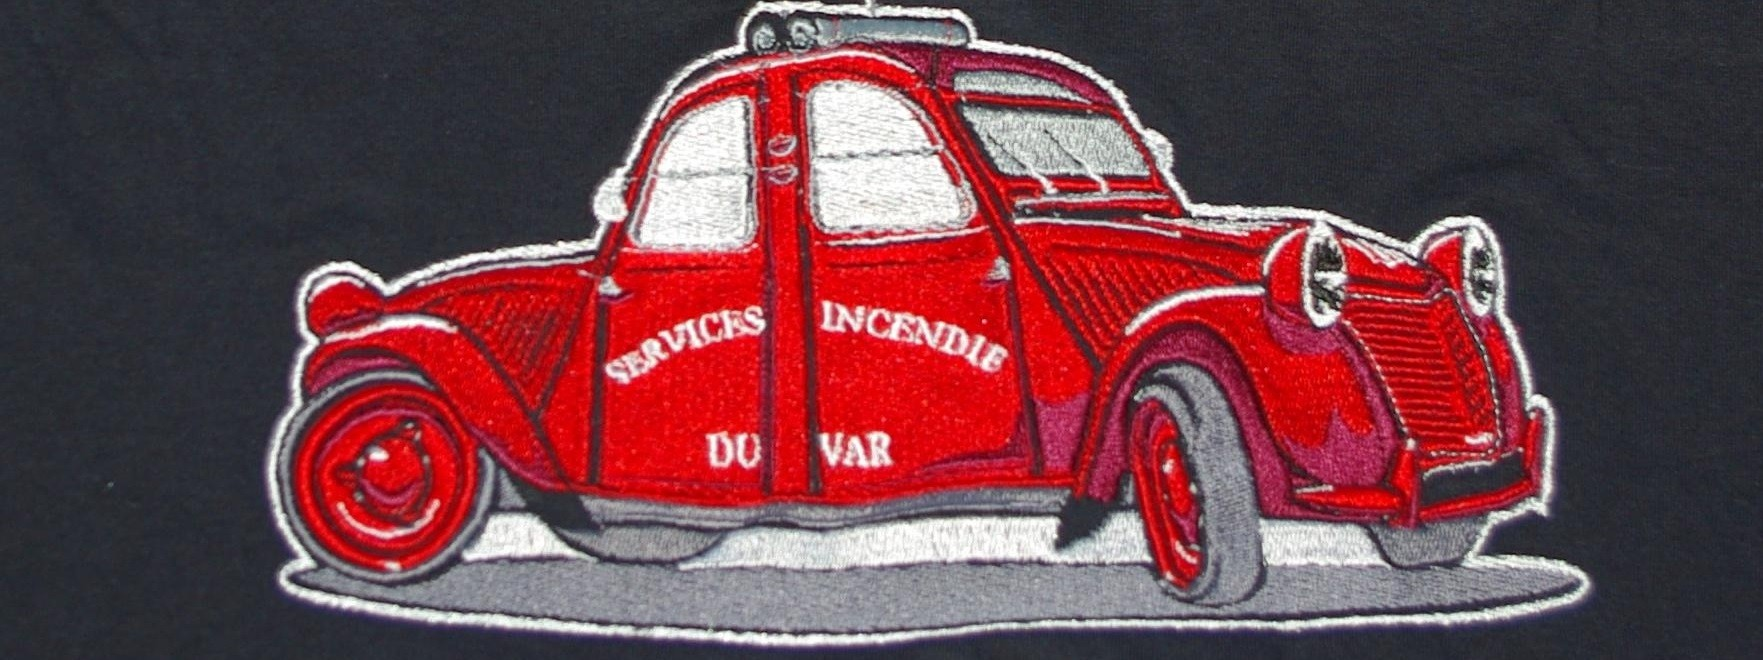 Broderie 2cv Pompiers Bicephale